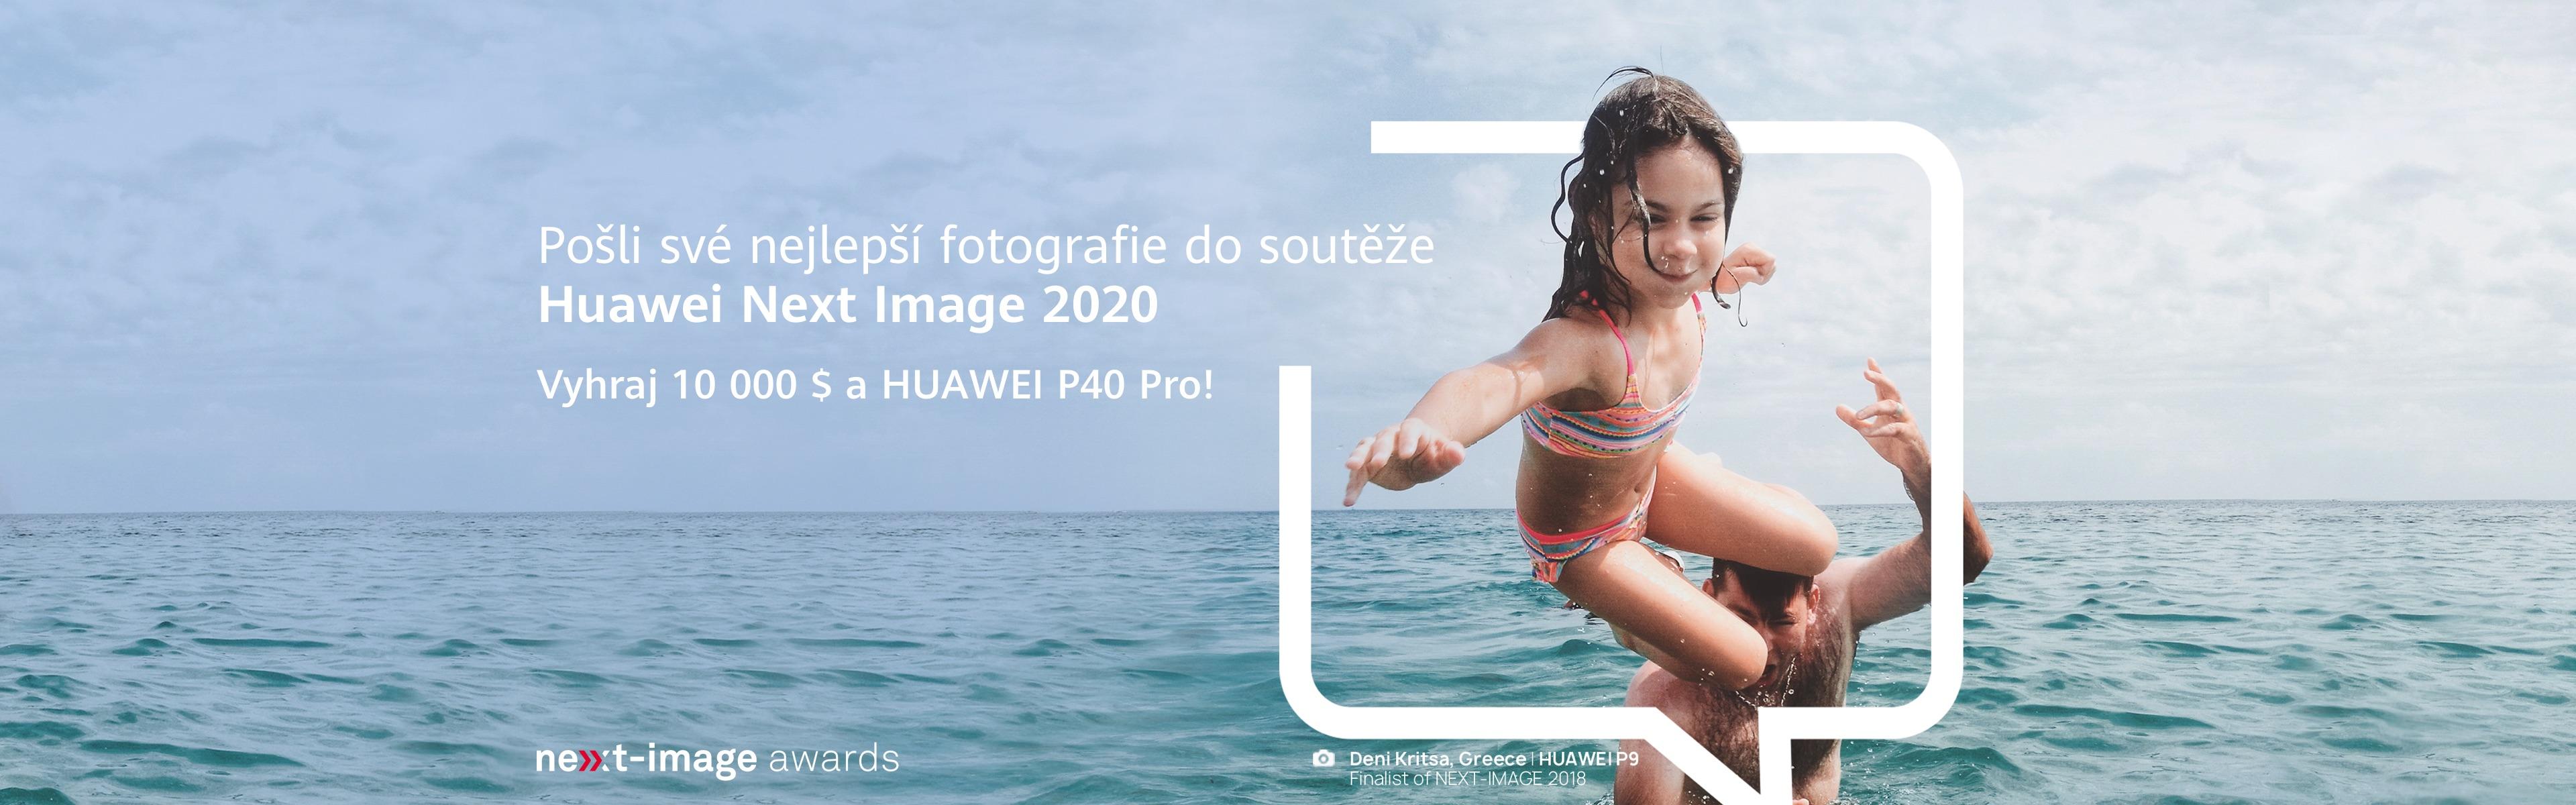 next-image-2020